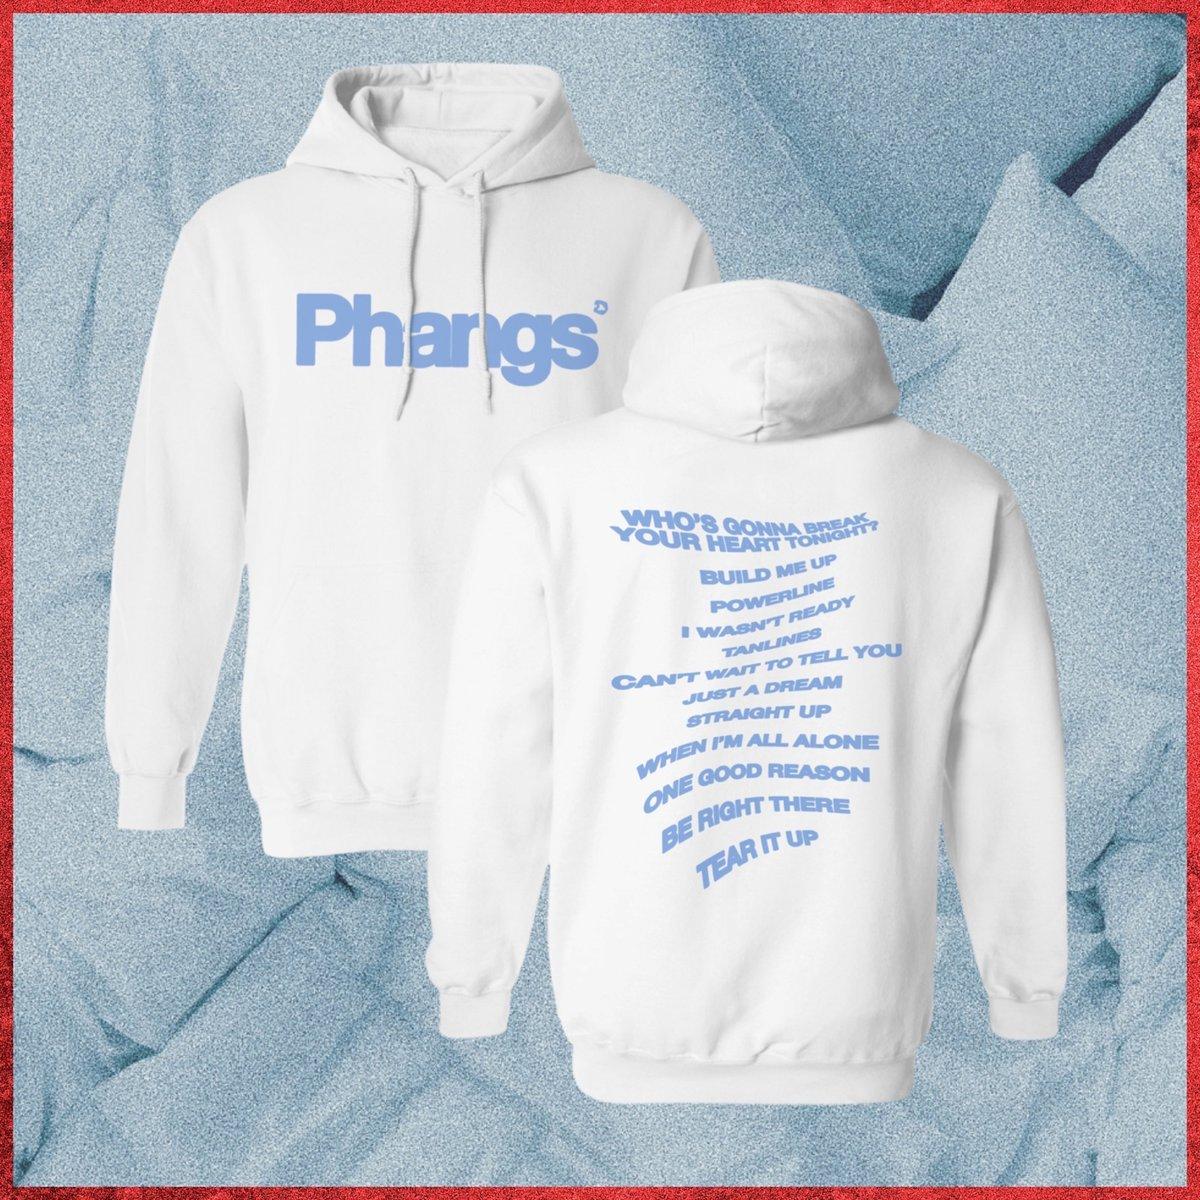 WGBYHT track list hoodie